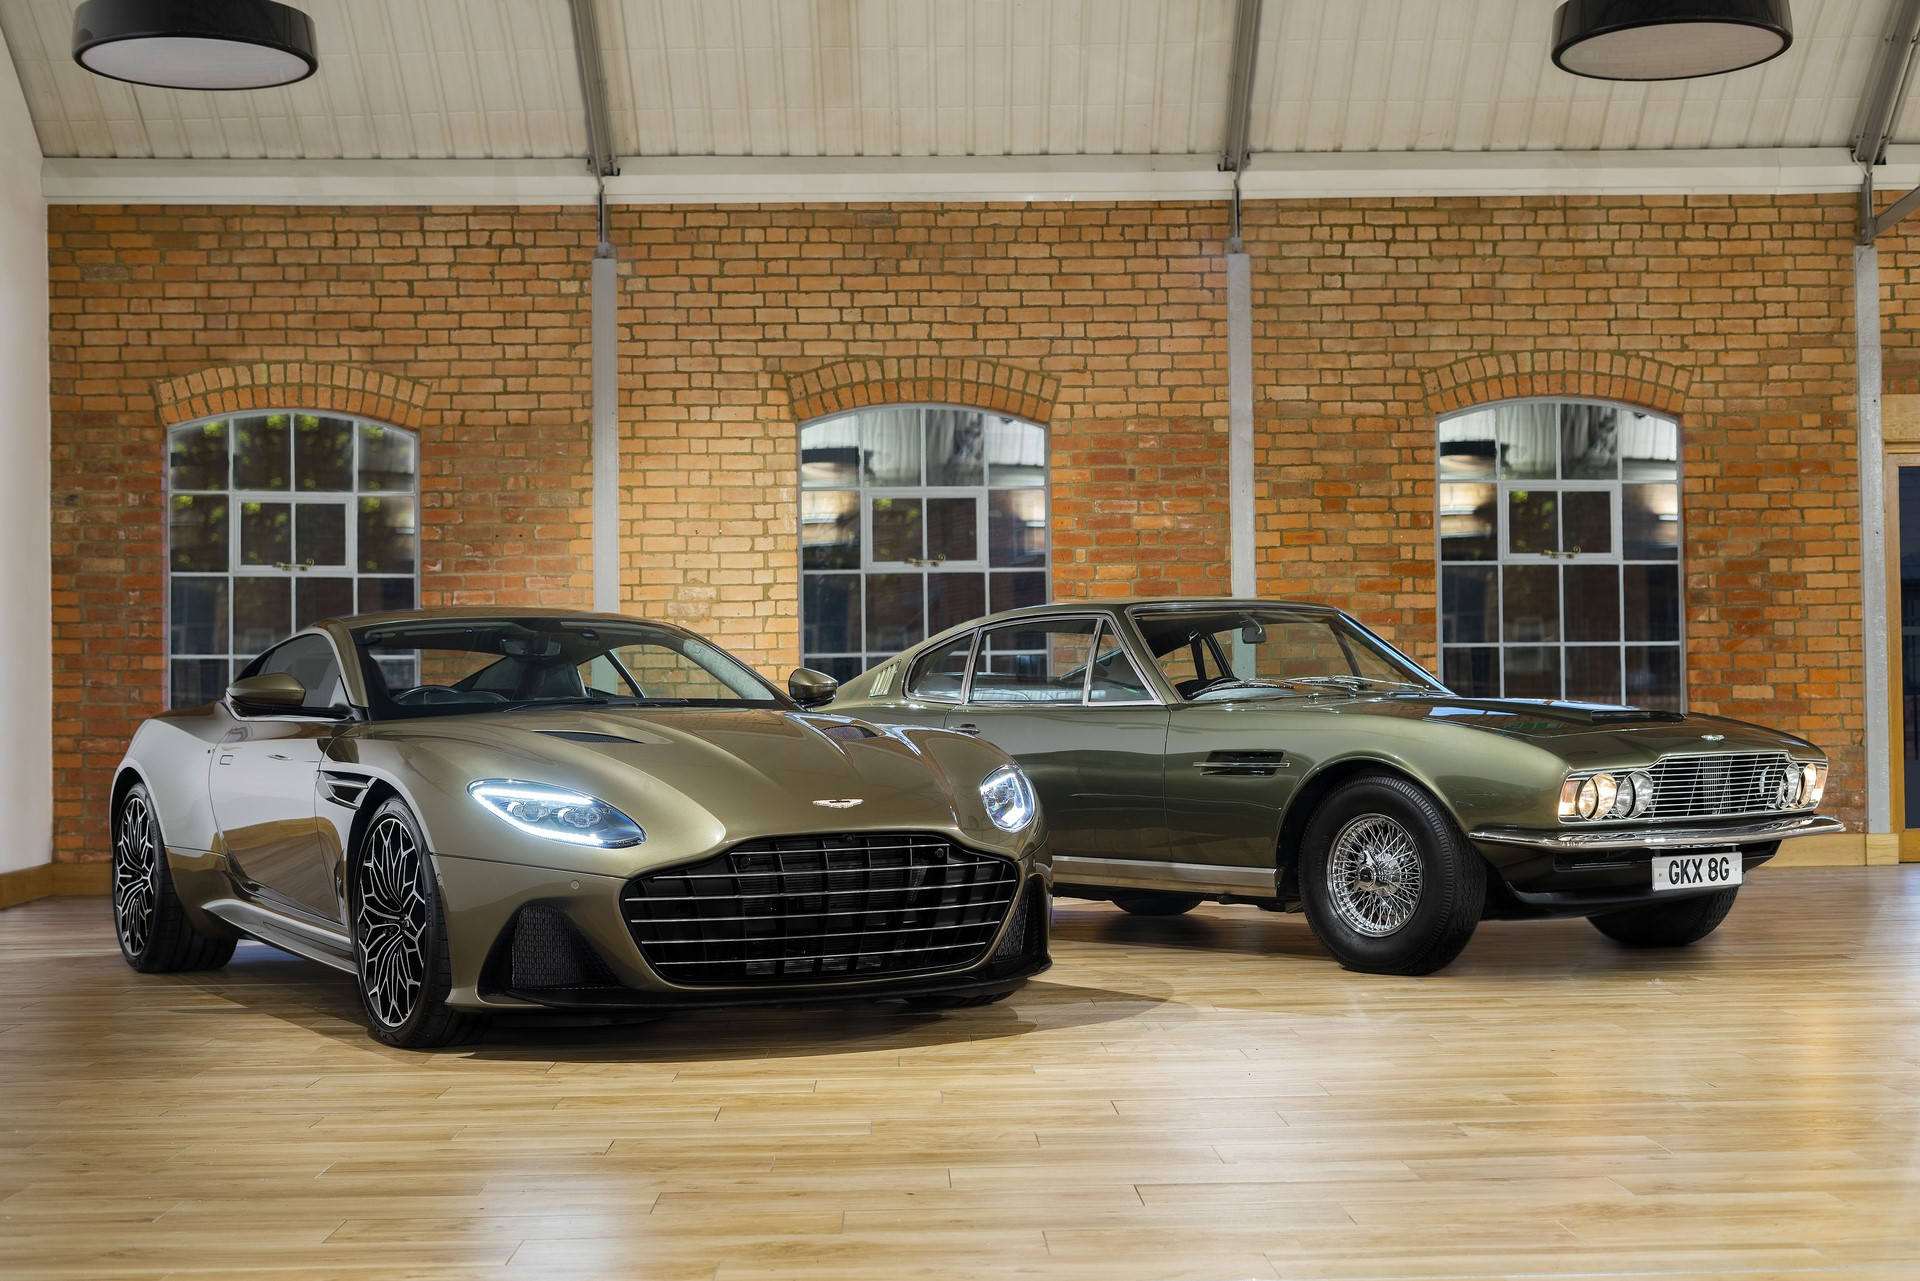 Aston-Martin-DBS-Superleggera-James-Bond-Special-Edition-1